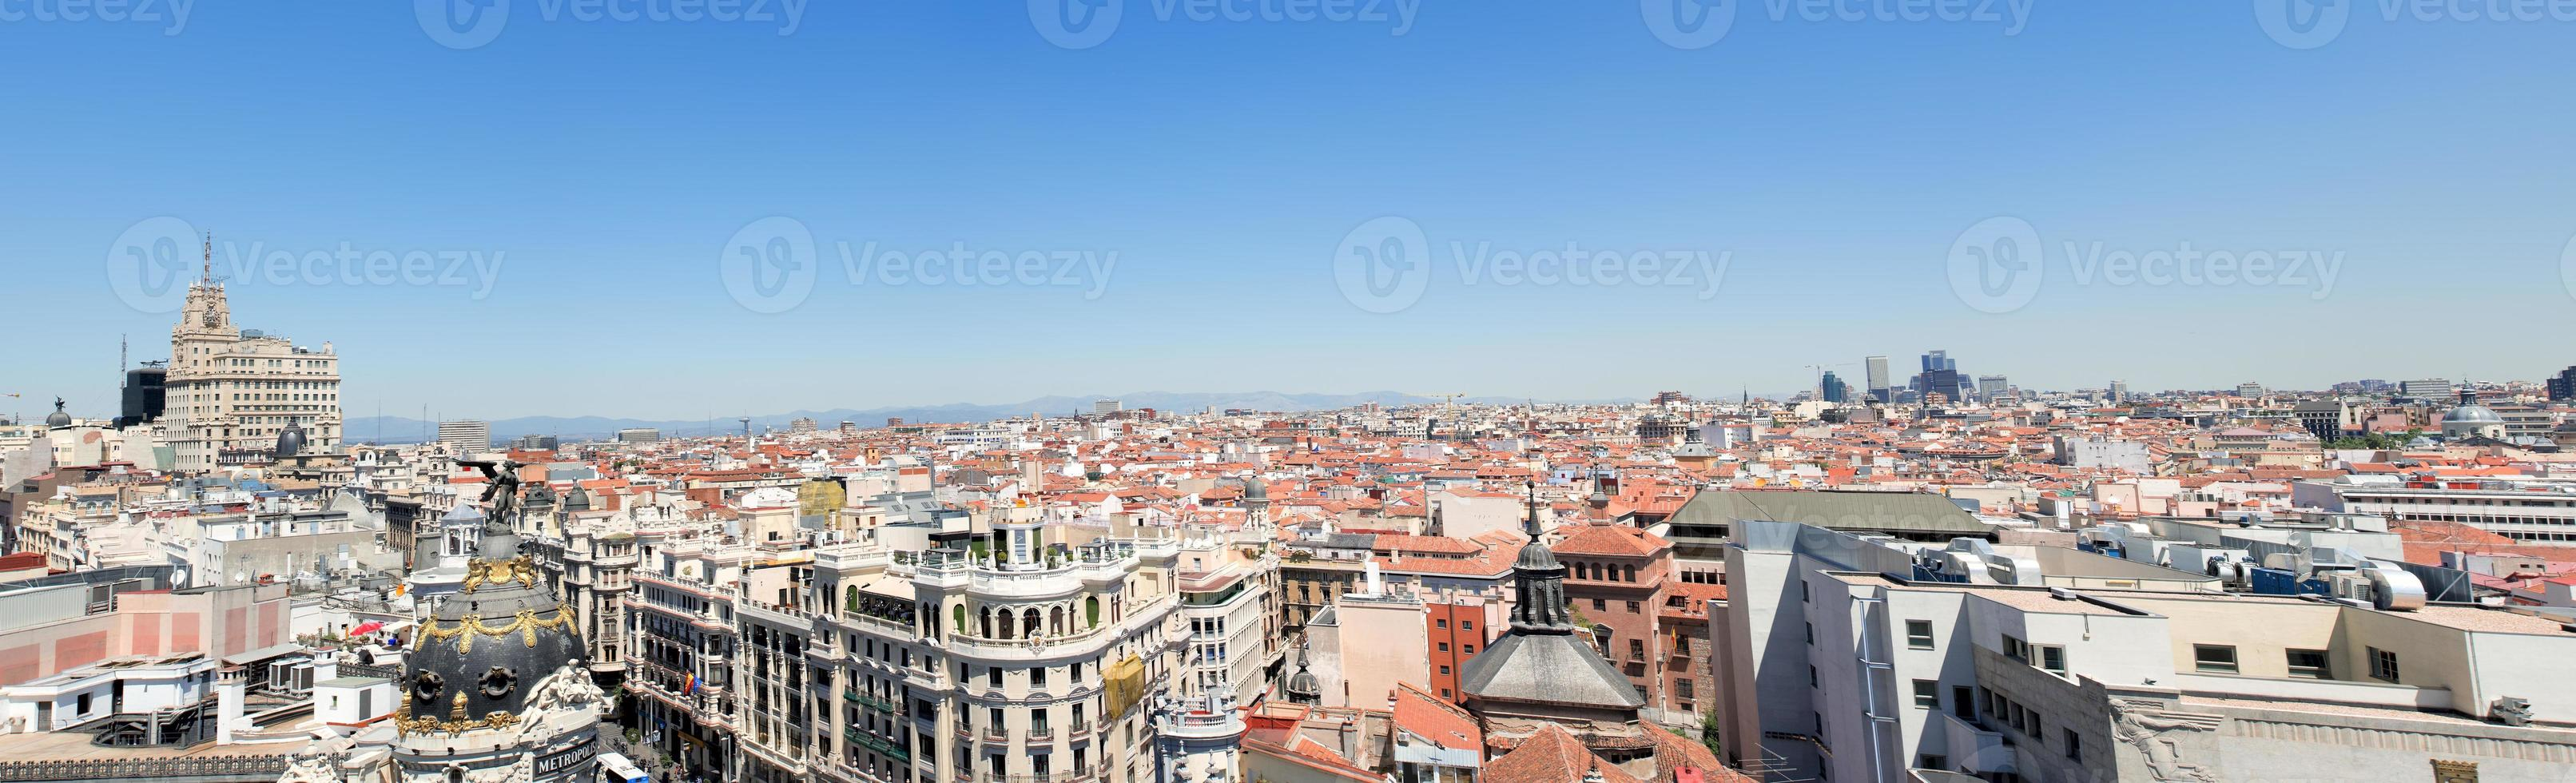 Panoramablick auf die Stadt foto